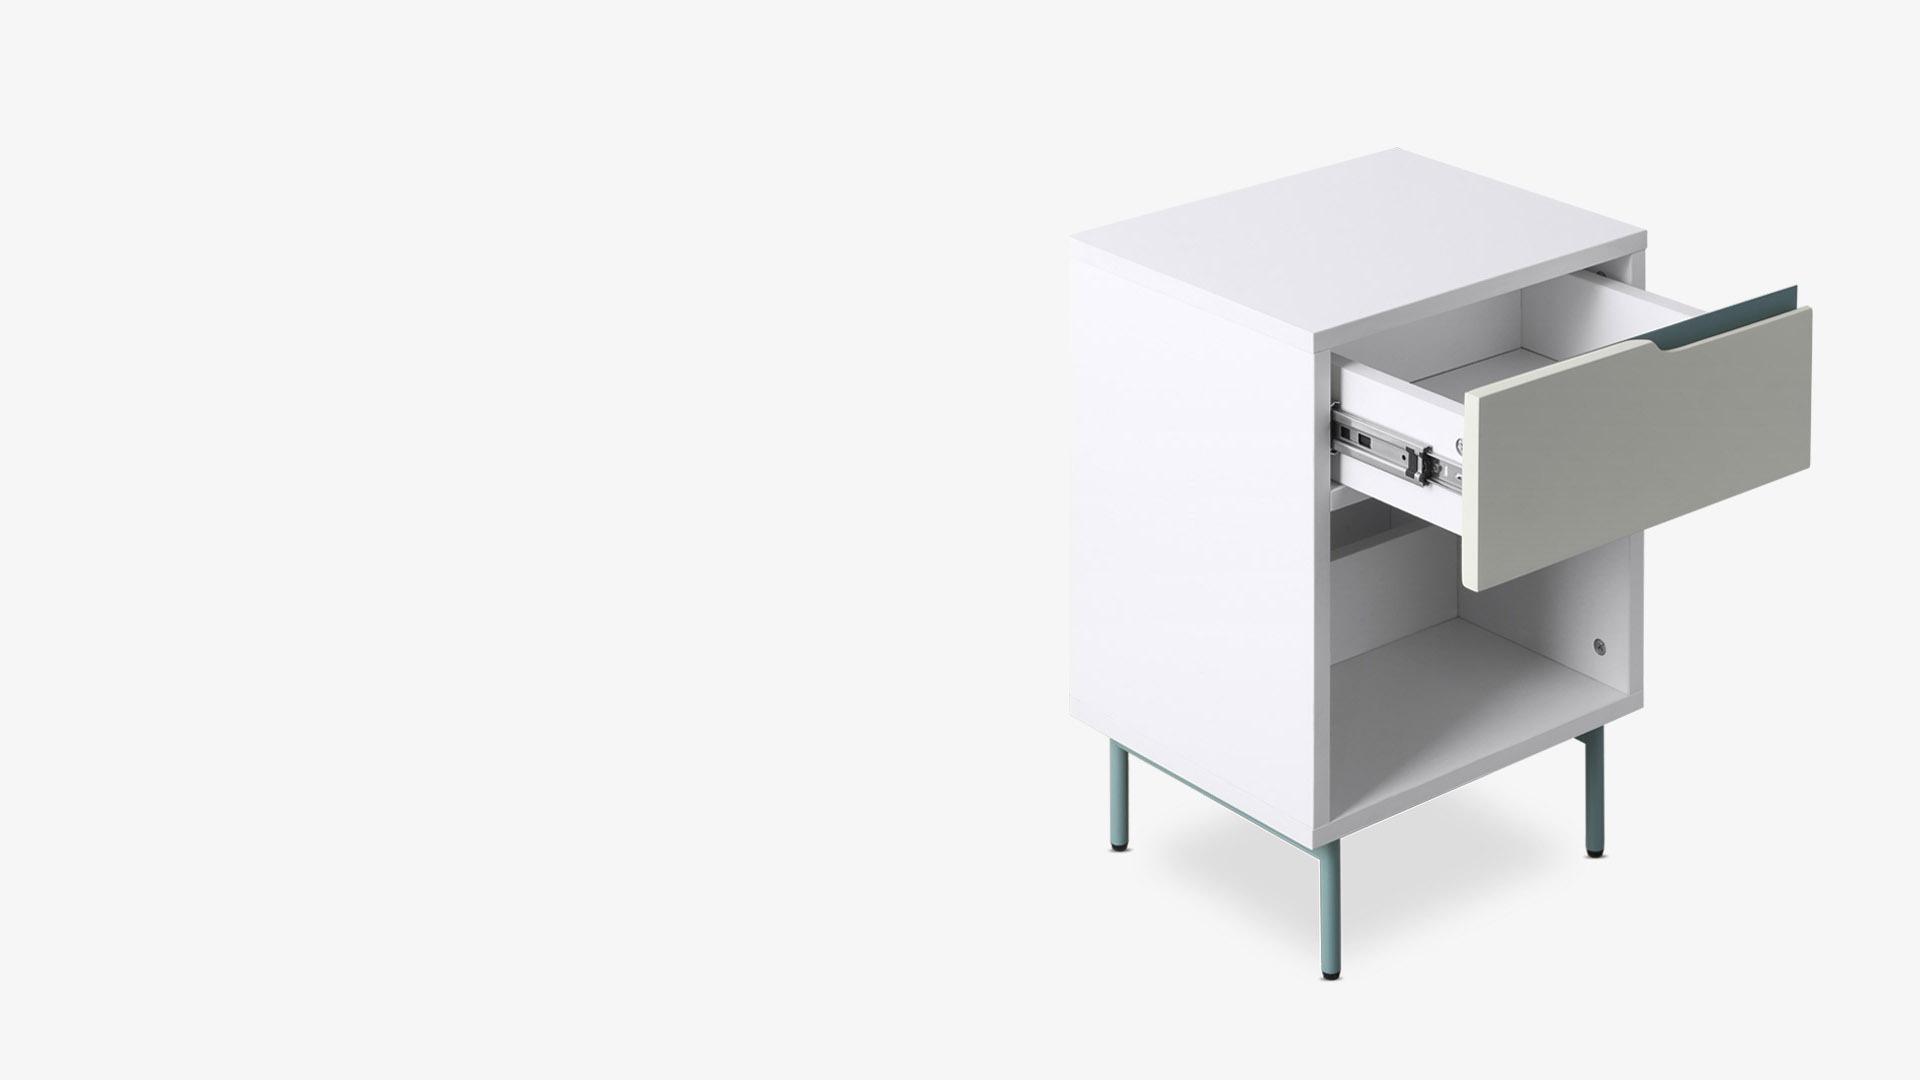 E0级环保板材+撞色金属<br/>小于0.5mm组件精细